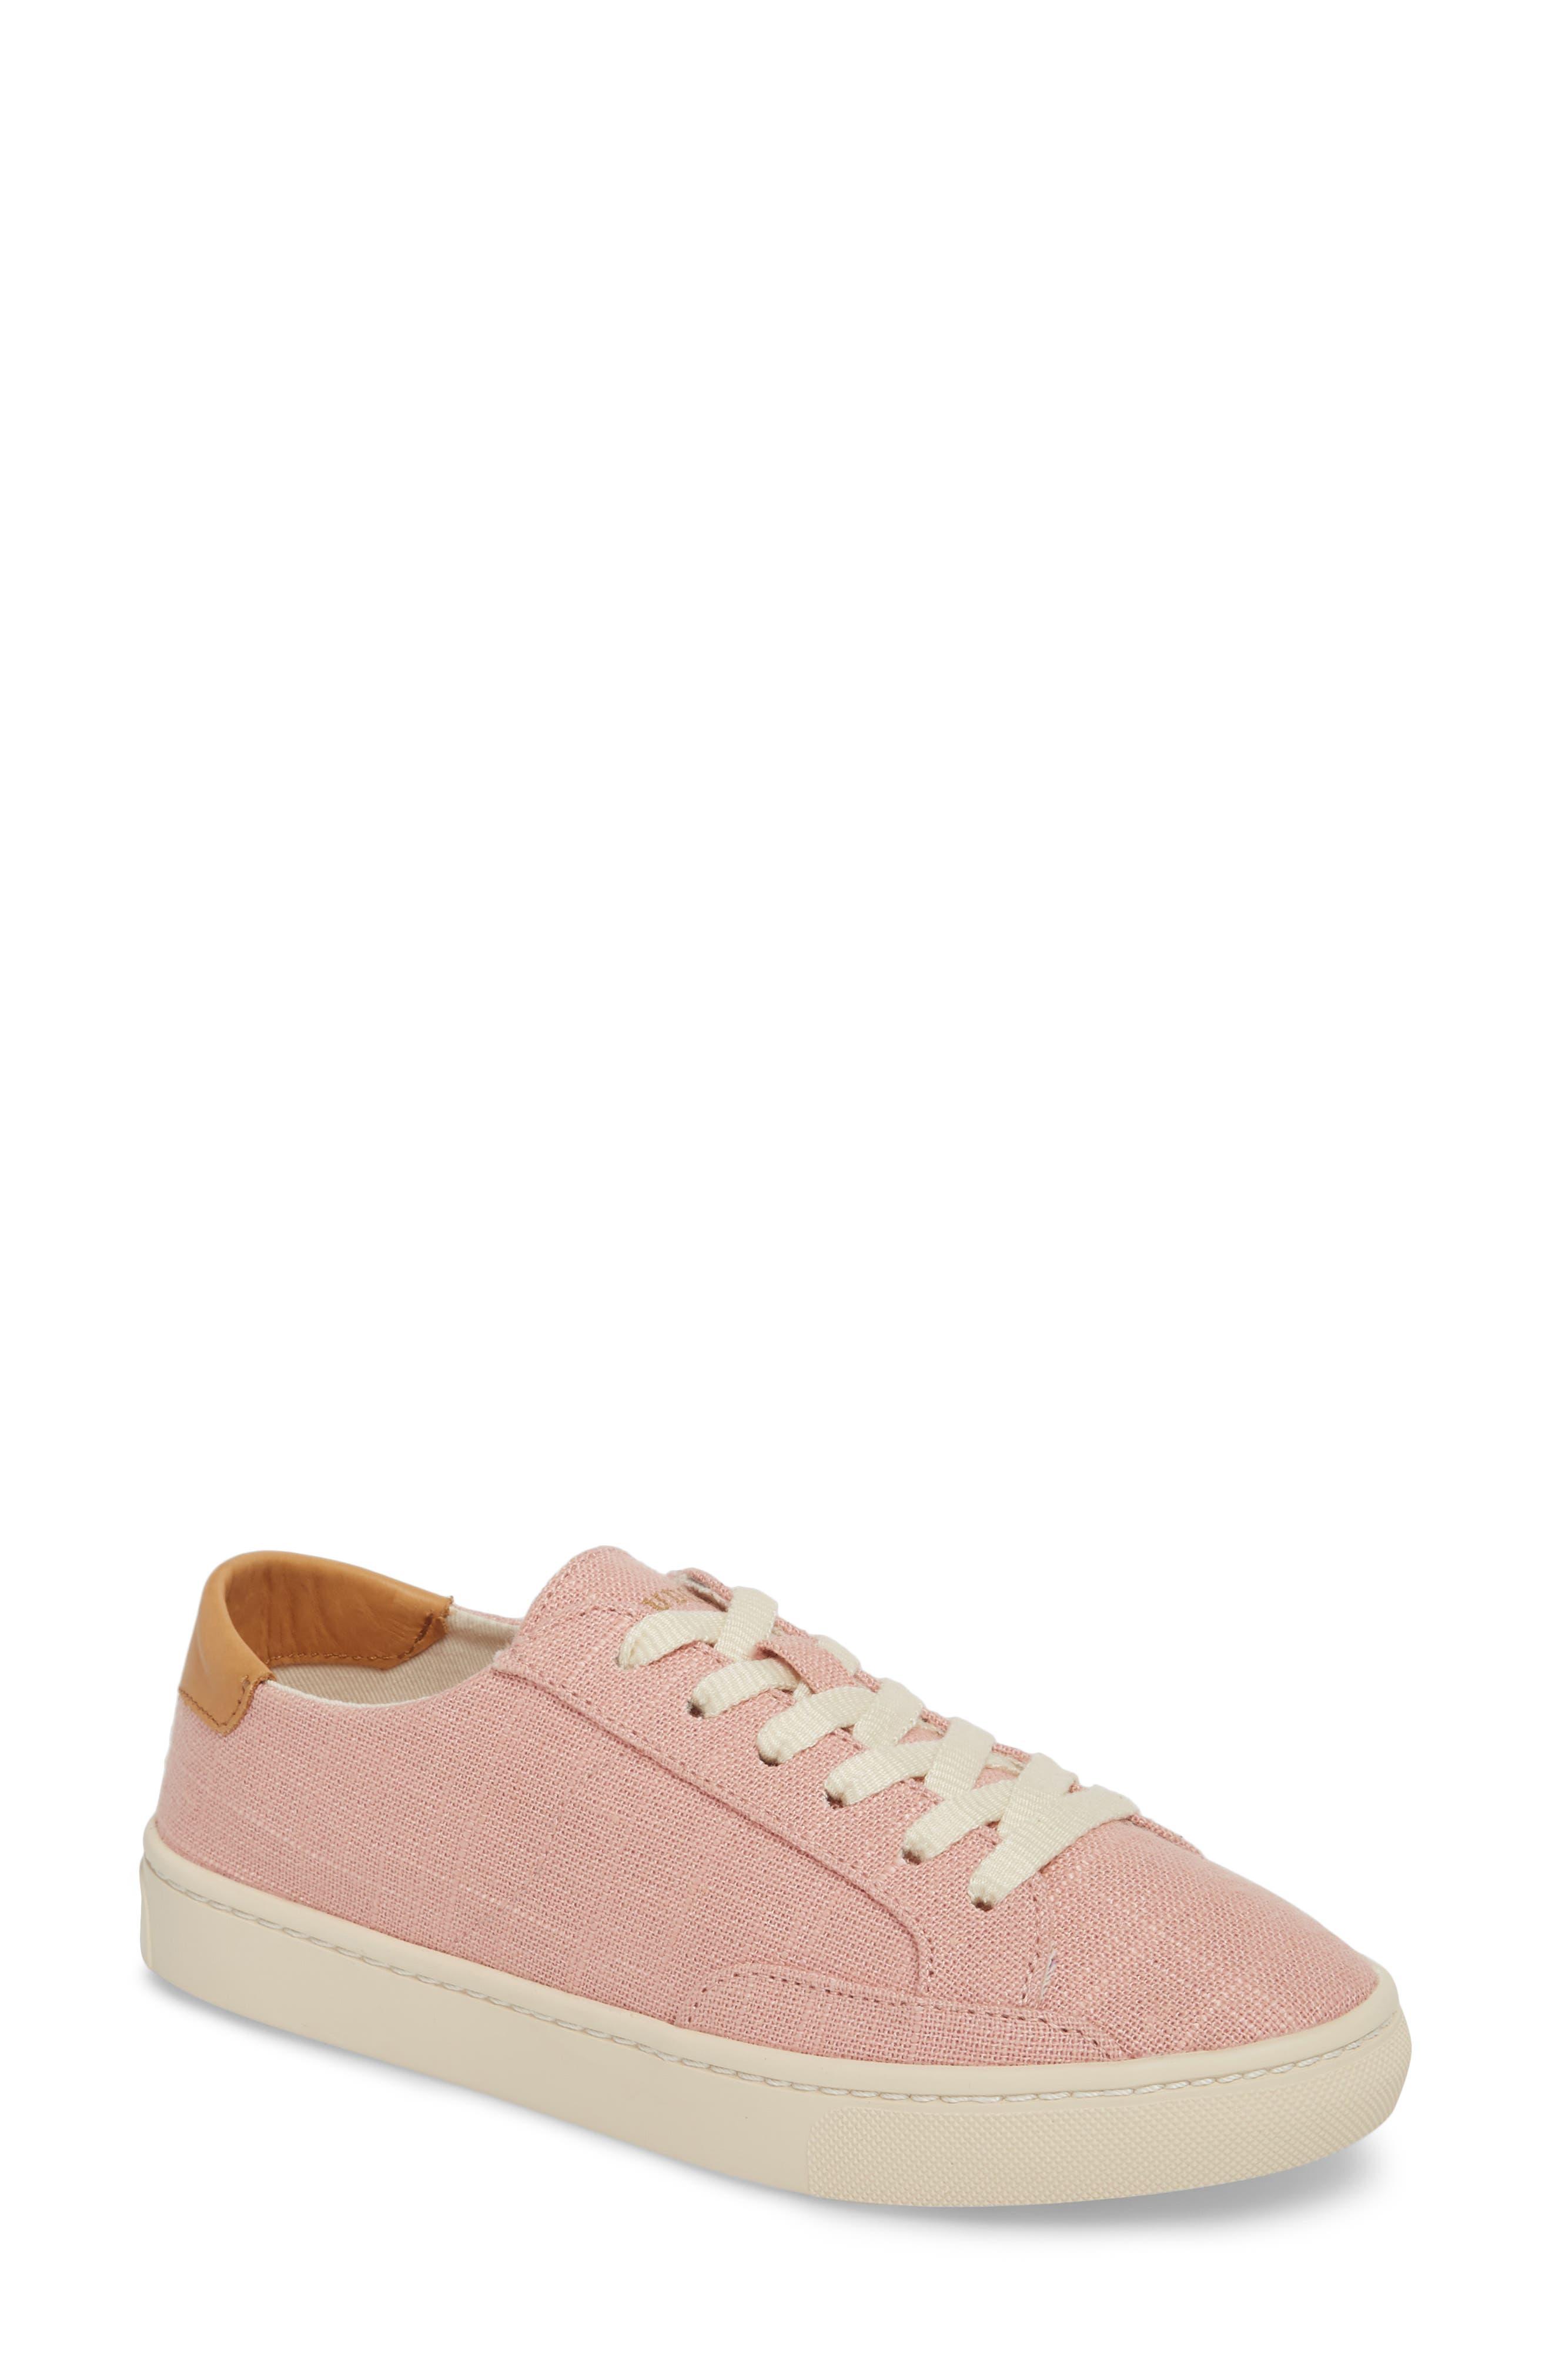 Ibiza Sneaker,                             Main thumbnail 1, color,                             Dusty Rose Fabric